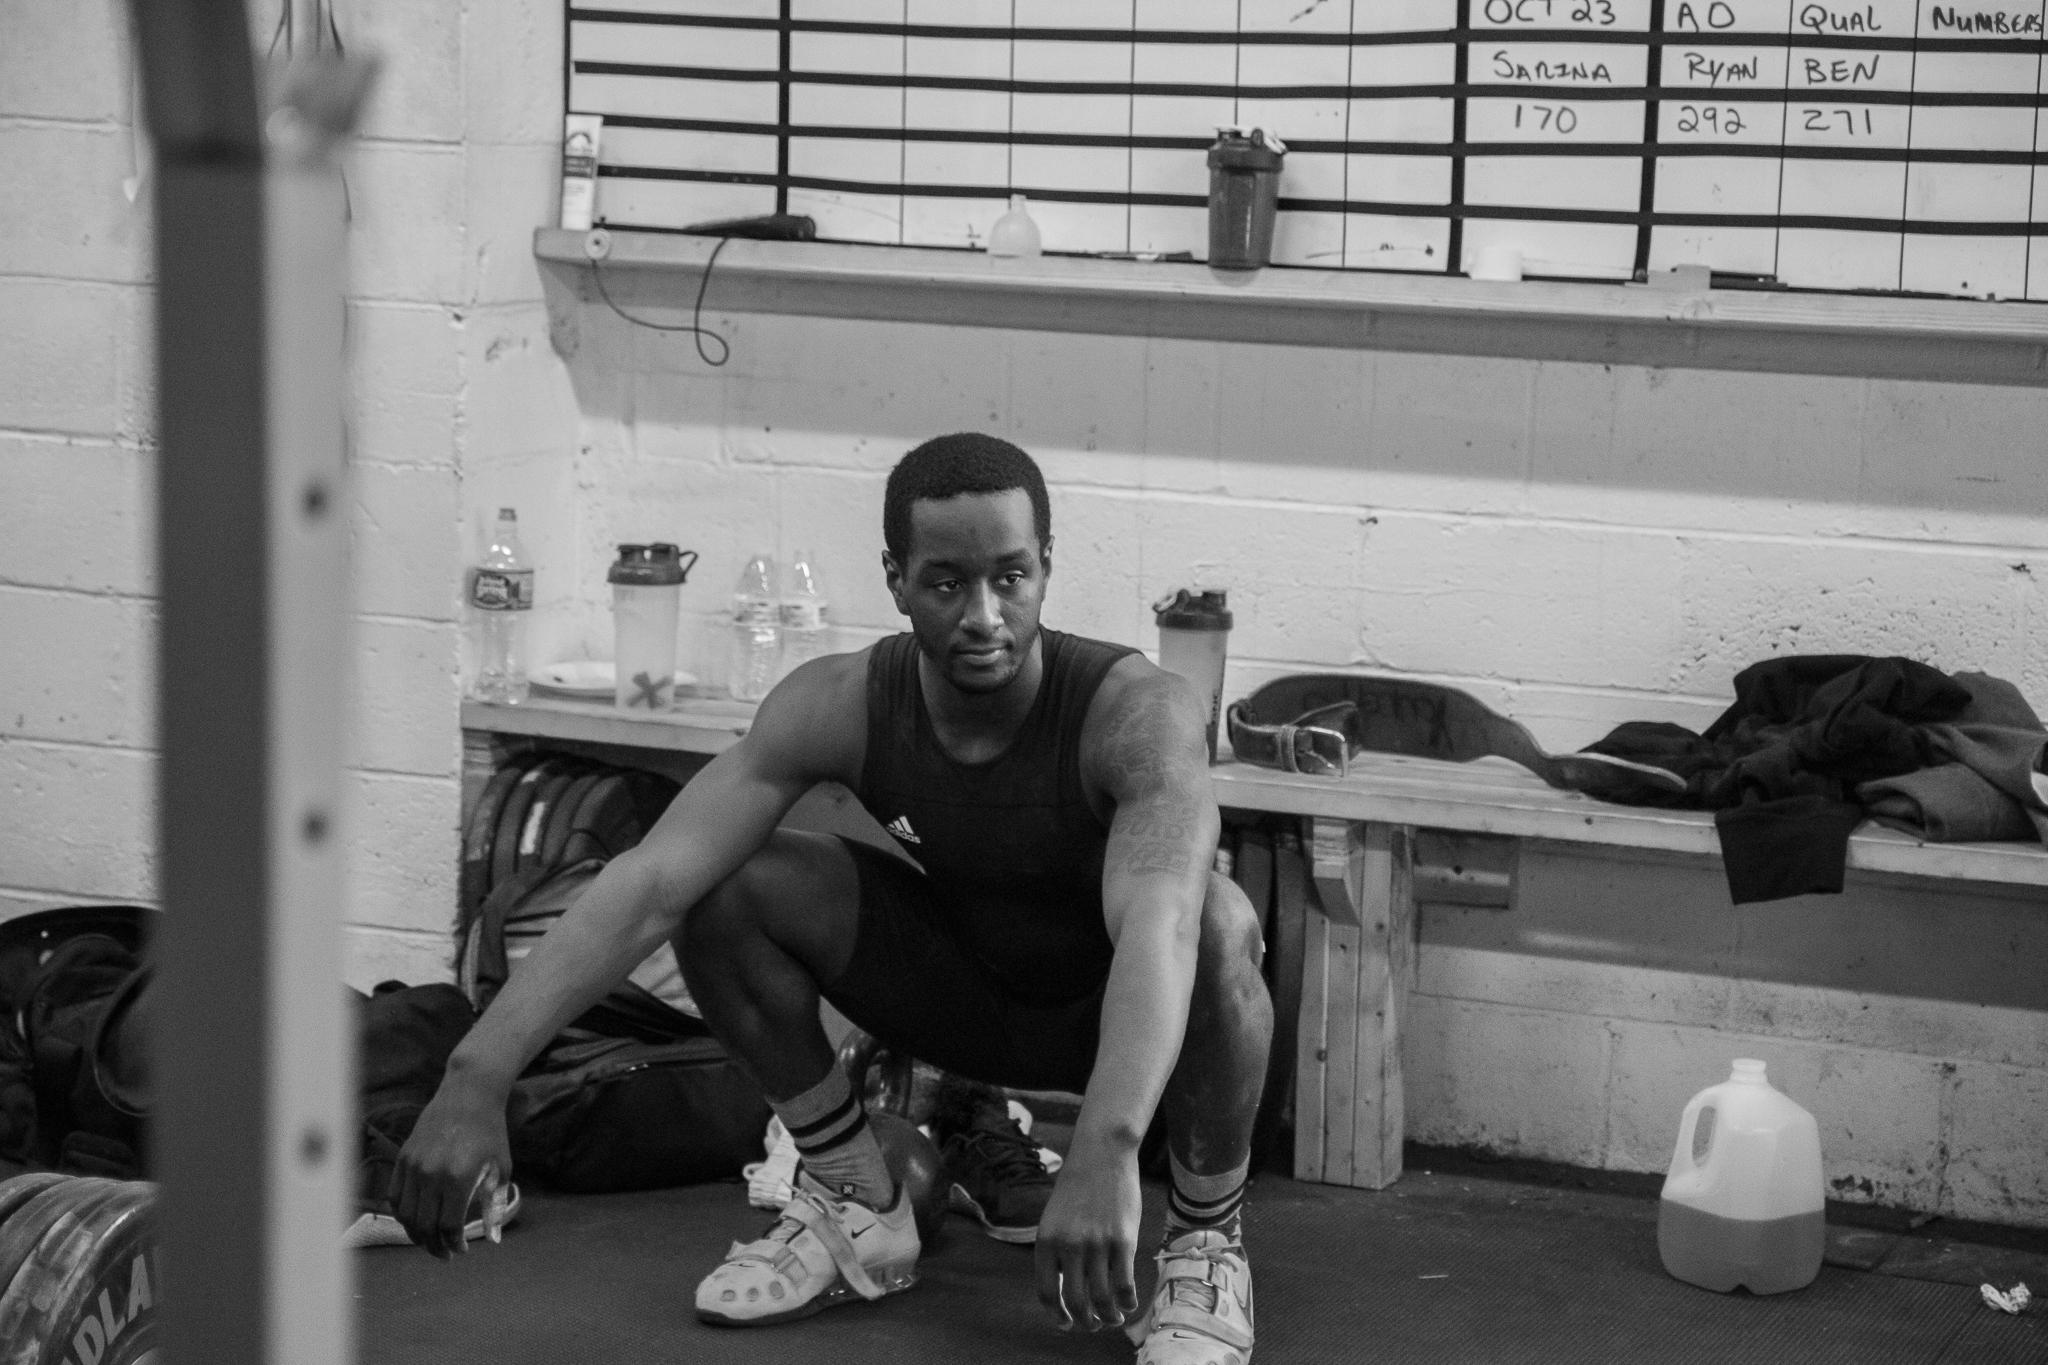 men-warwick-new-york-intrepid-strength-conditioning-winter-open-weightlifting-meet-weightlifting-photography (23 of 24).jpg